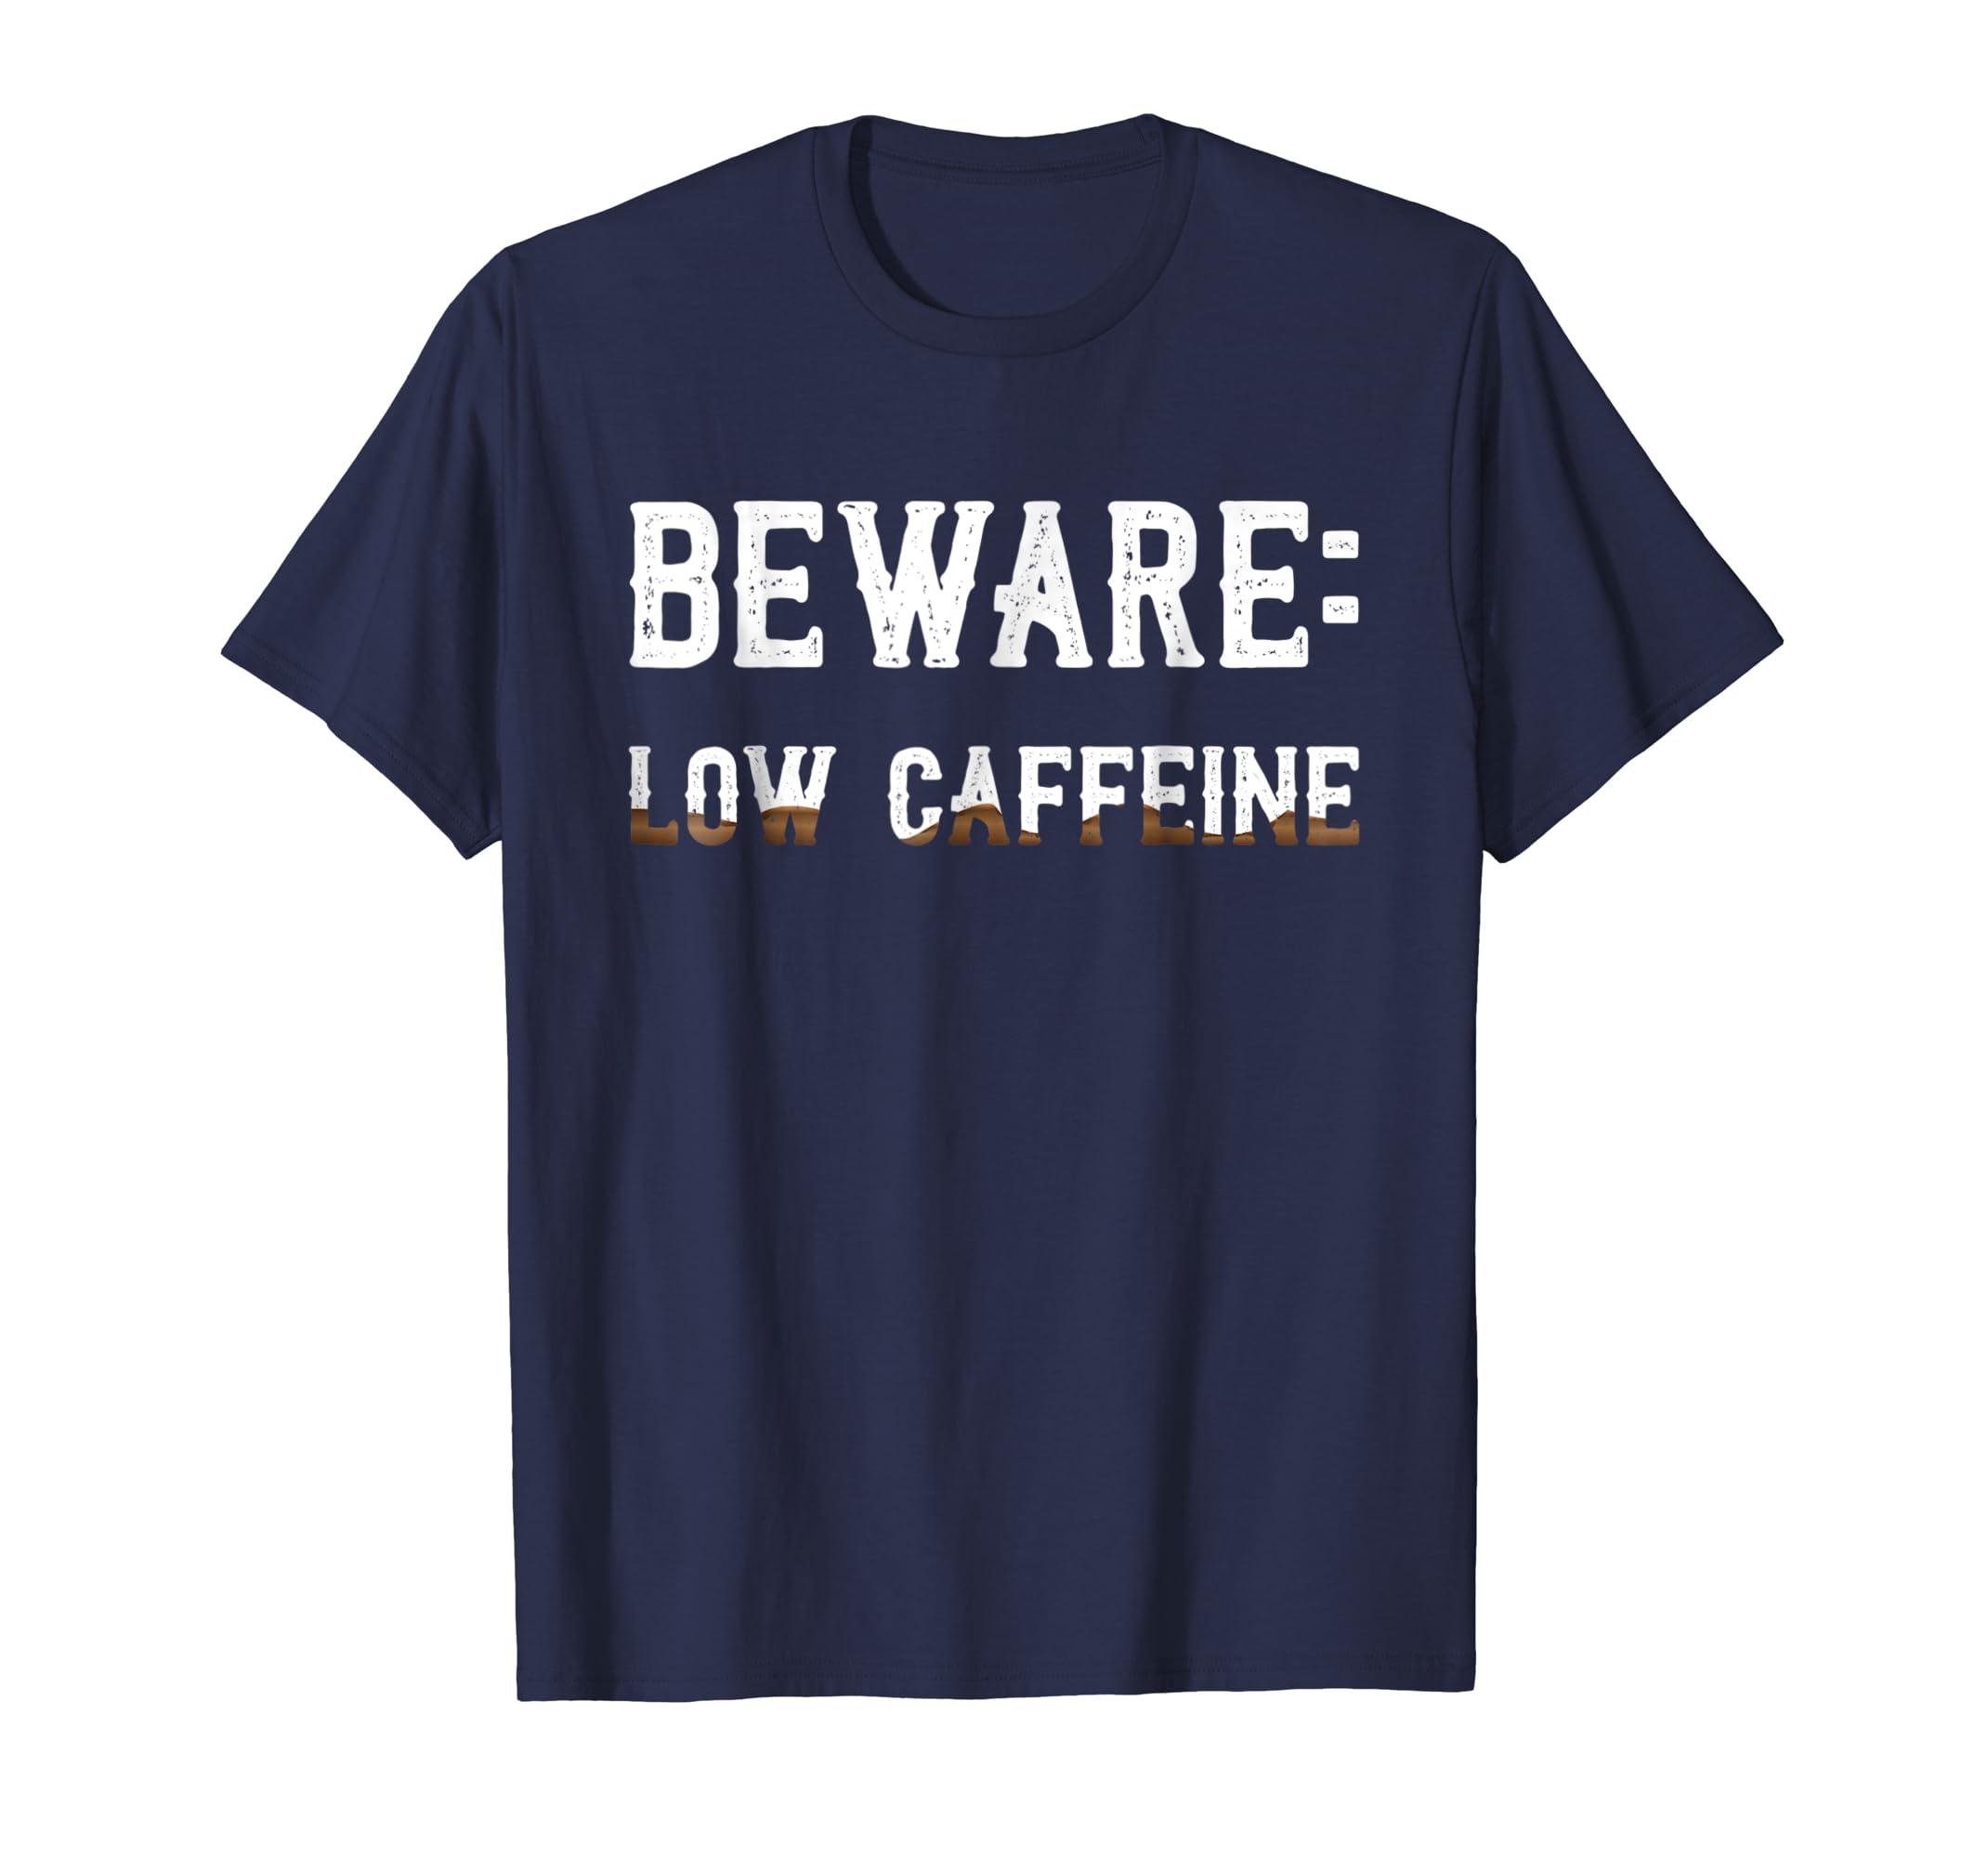 Beware Low Caffeine Funny Sarcastic Coffee T Shirt-ln